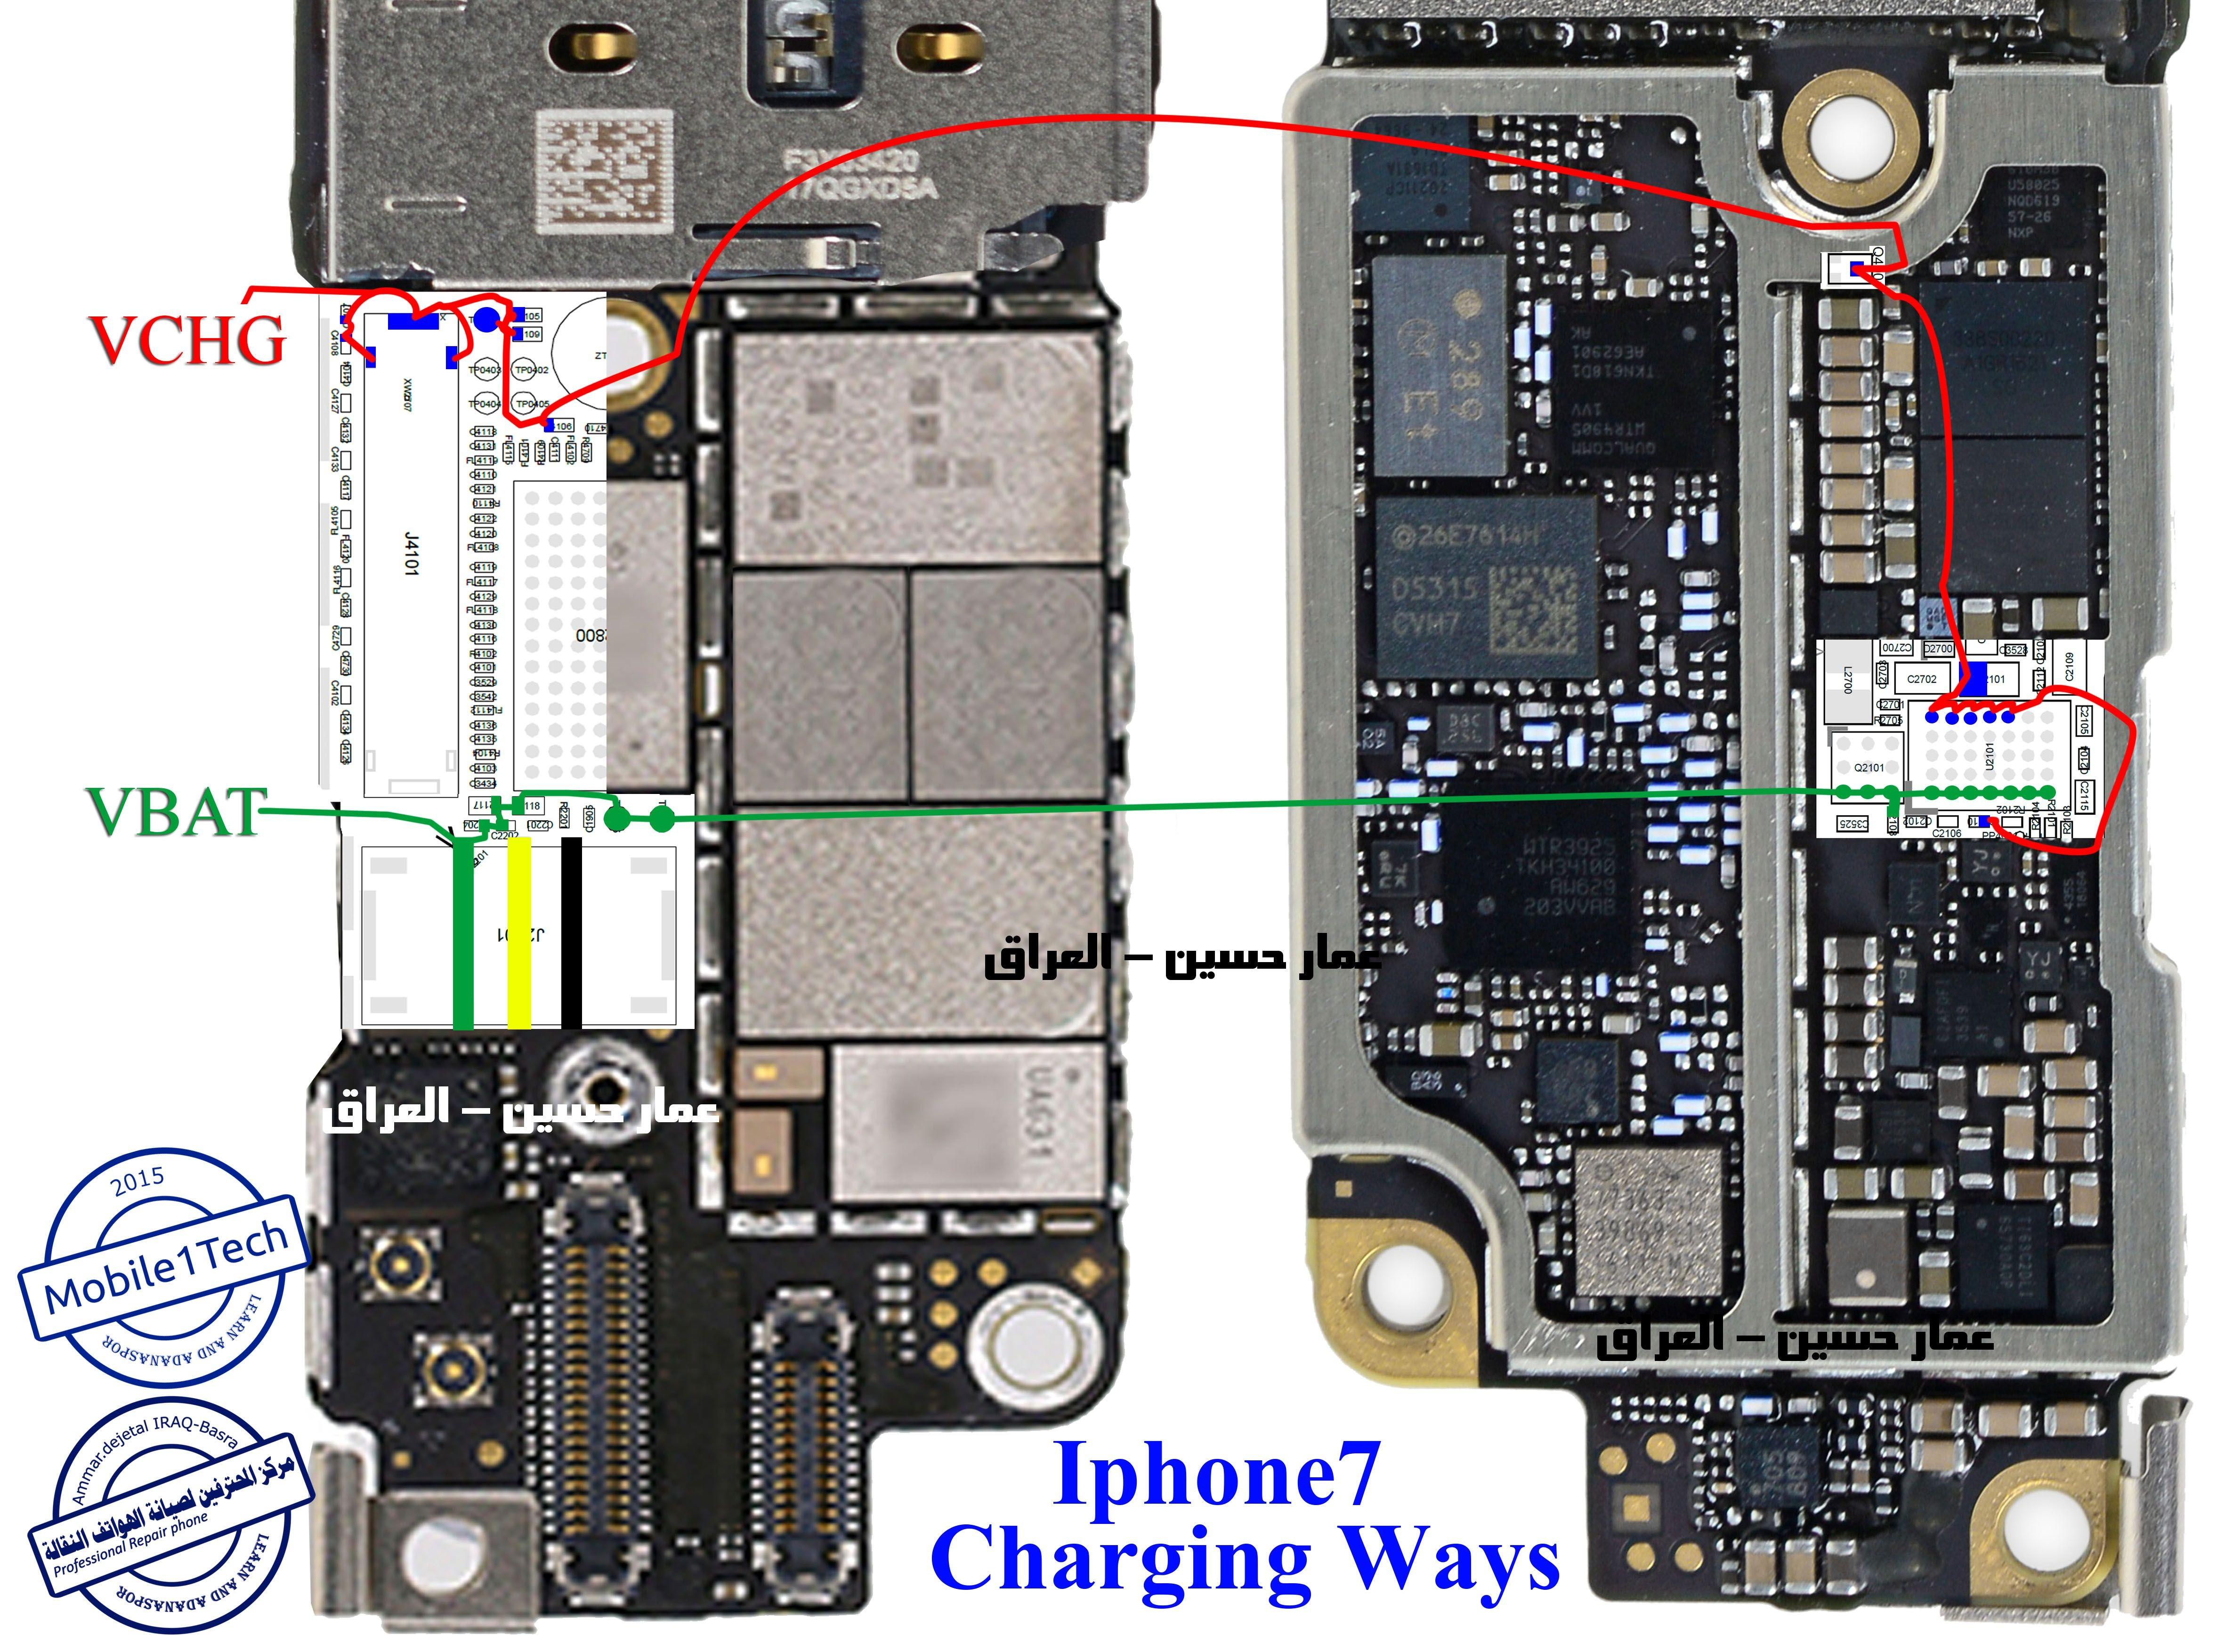 iPhone 5s Logic Board Schematic iPhone 7 Charging Problem solution Ways Of iPhone 5s Logic Board Schematic